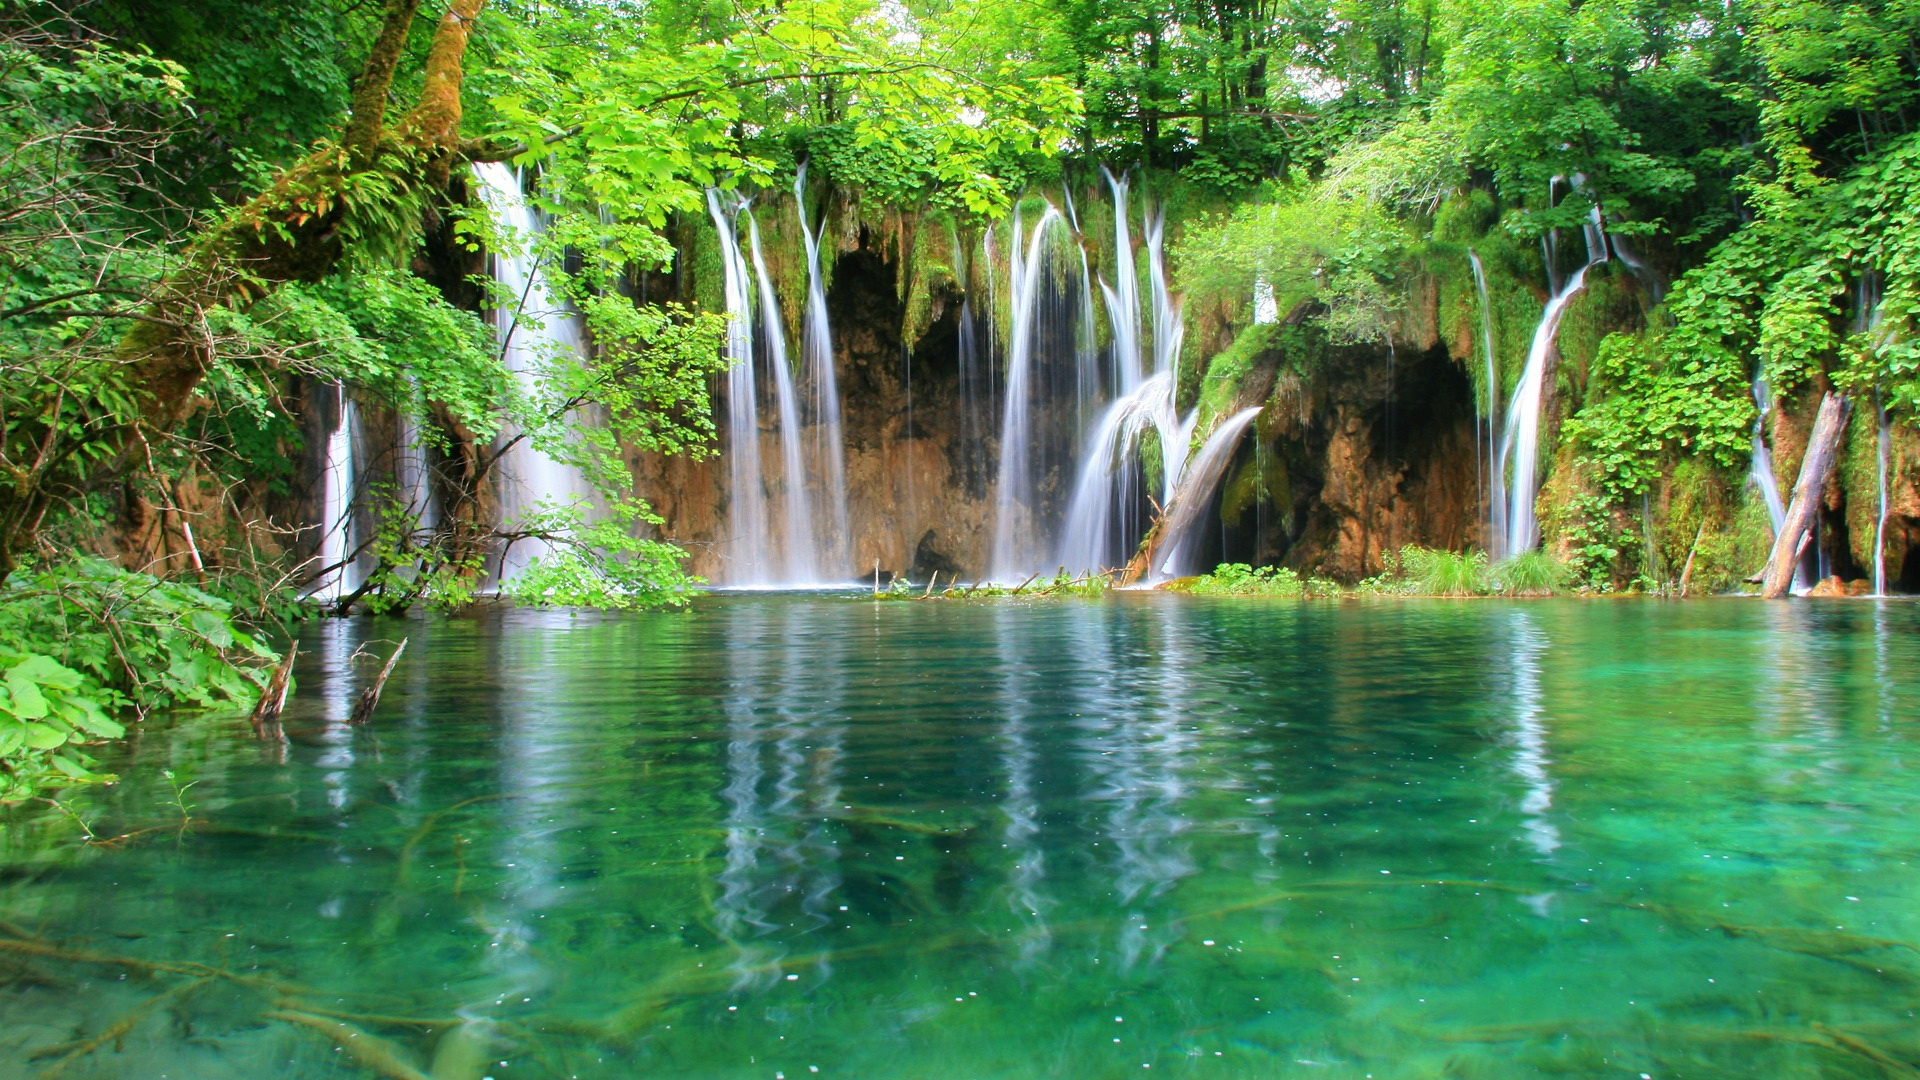 water_falls_jungle_wood_1138_1920x1080